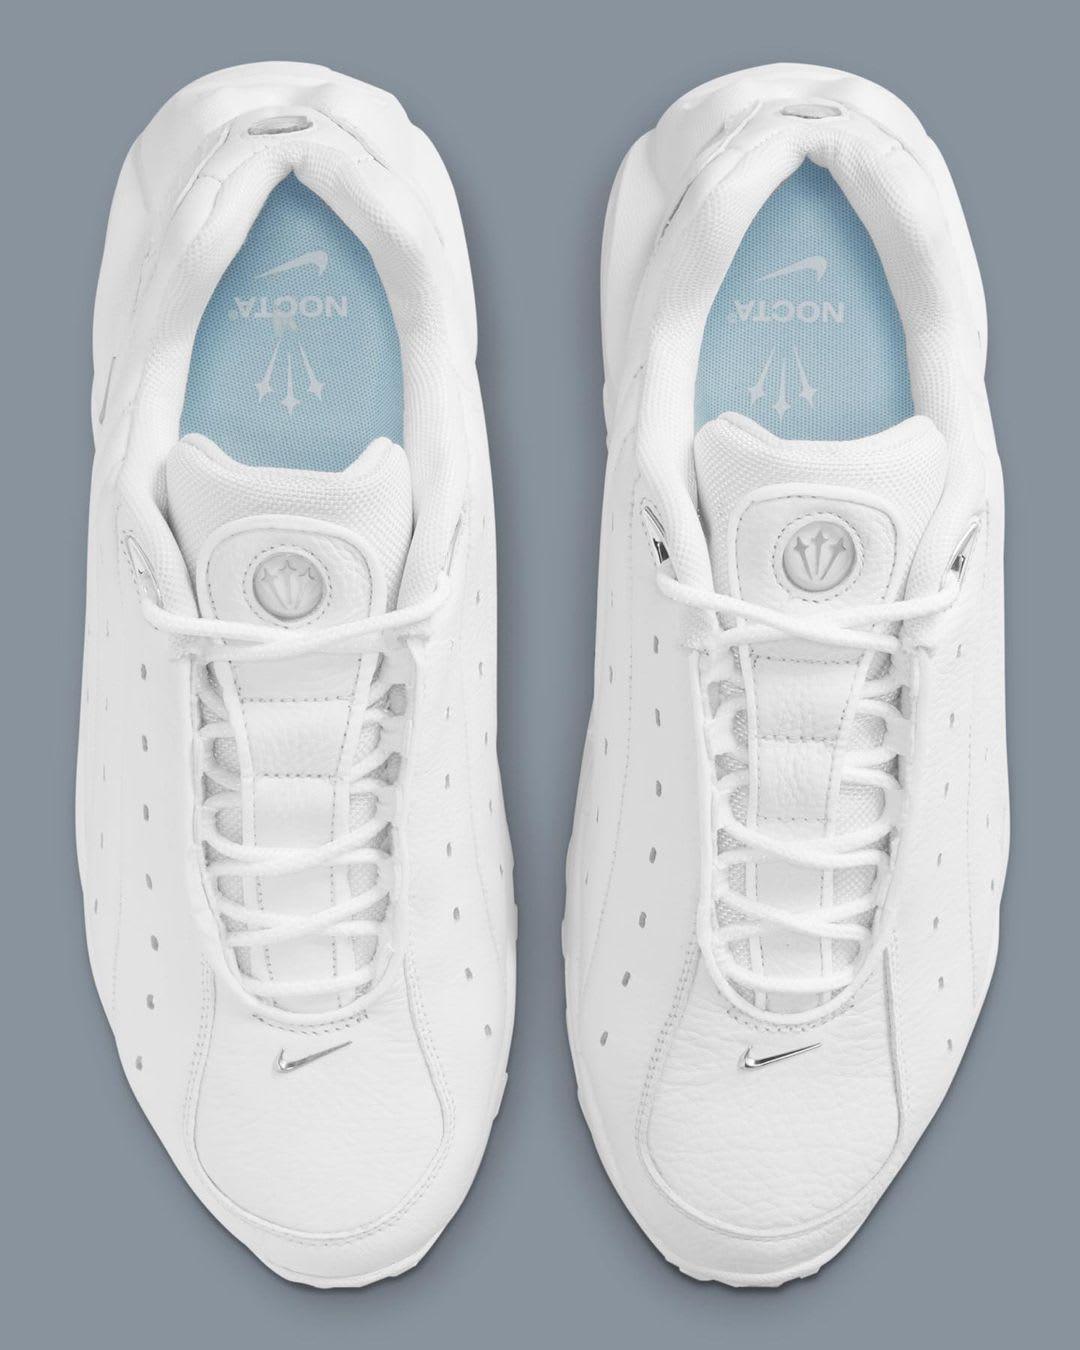 Drake NOCTA x Nike Hot Step Air Terra White Top